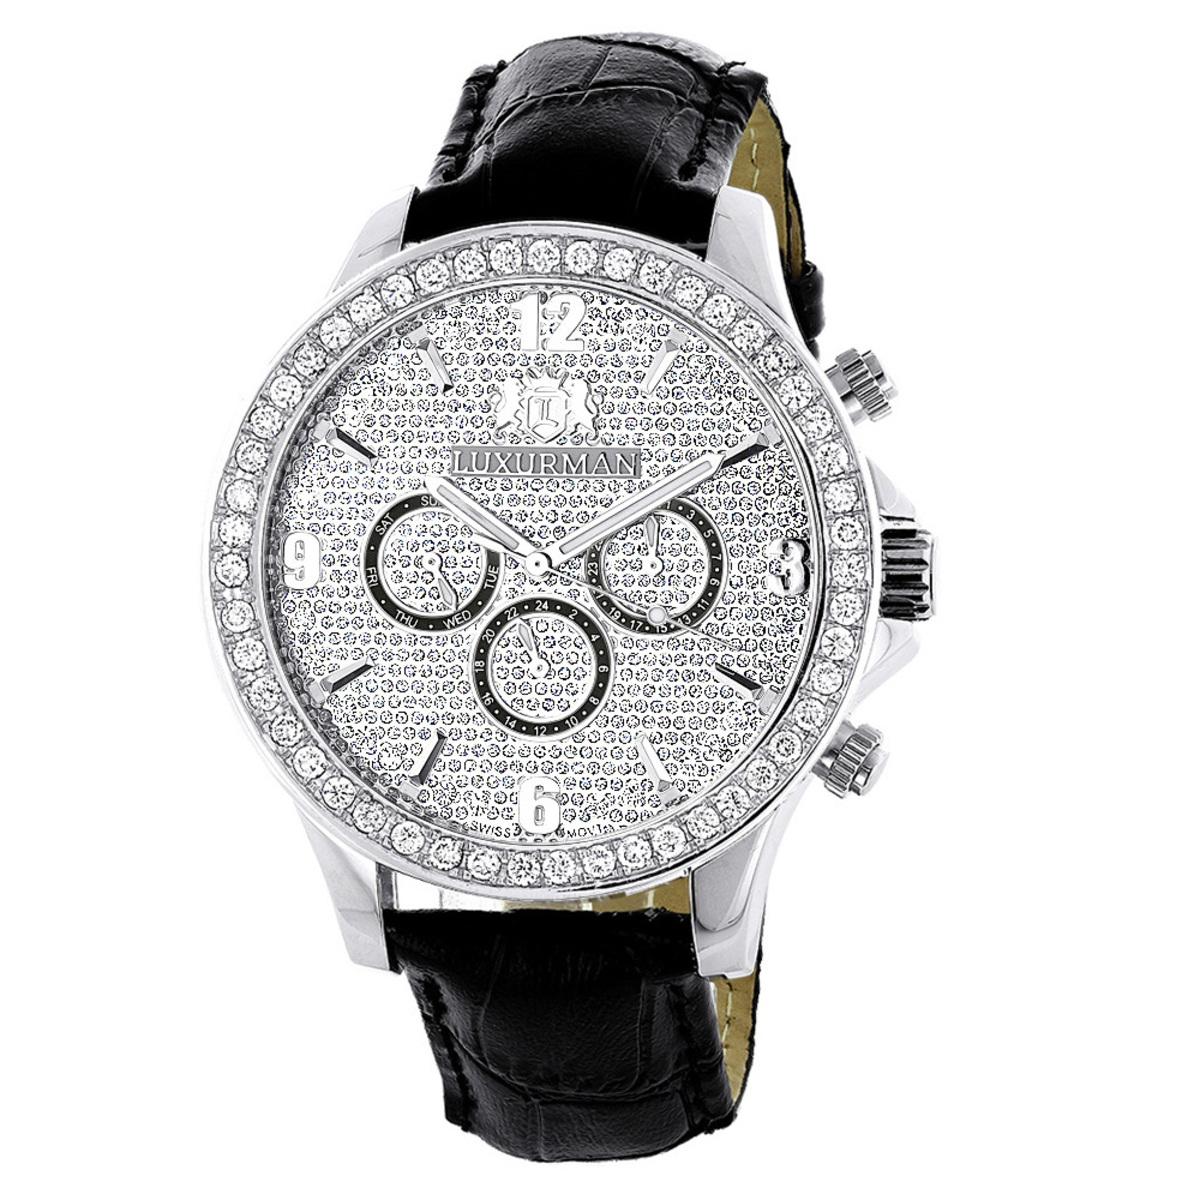 Luxurman Watches: Mens Diamond Watch 3ct